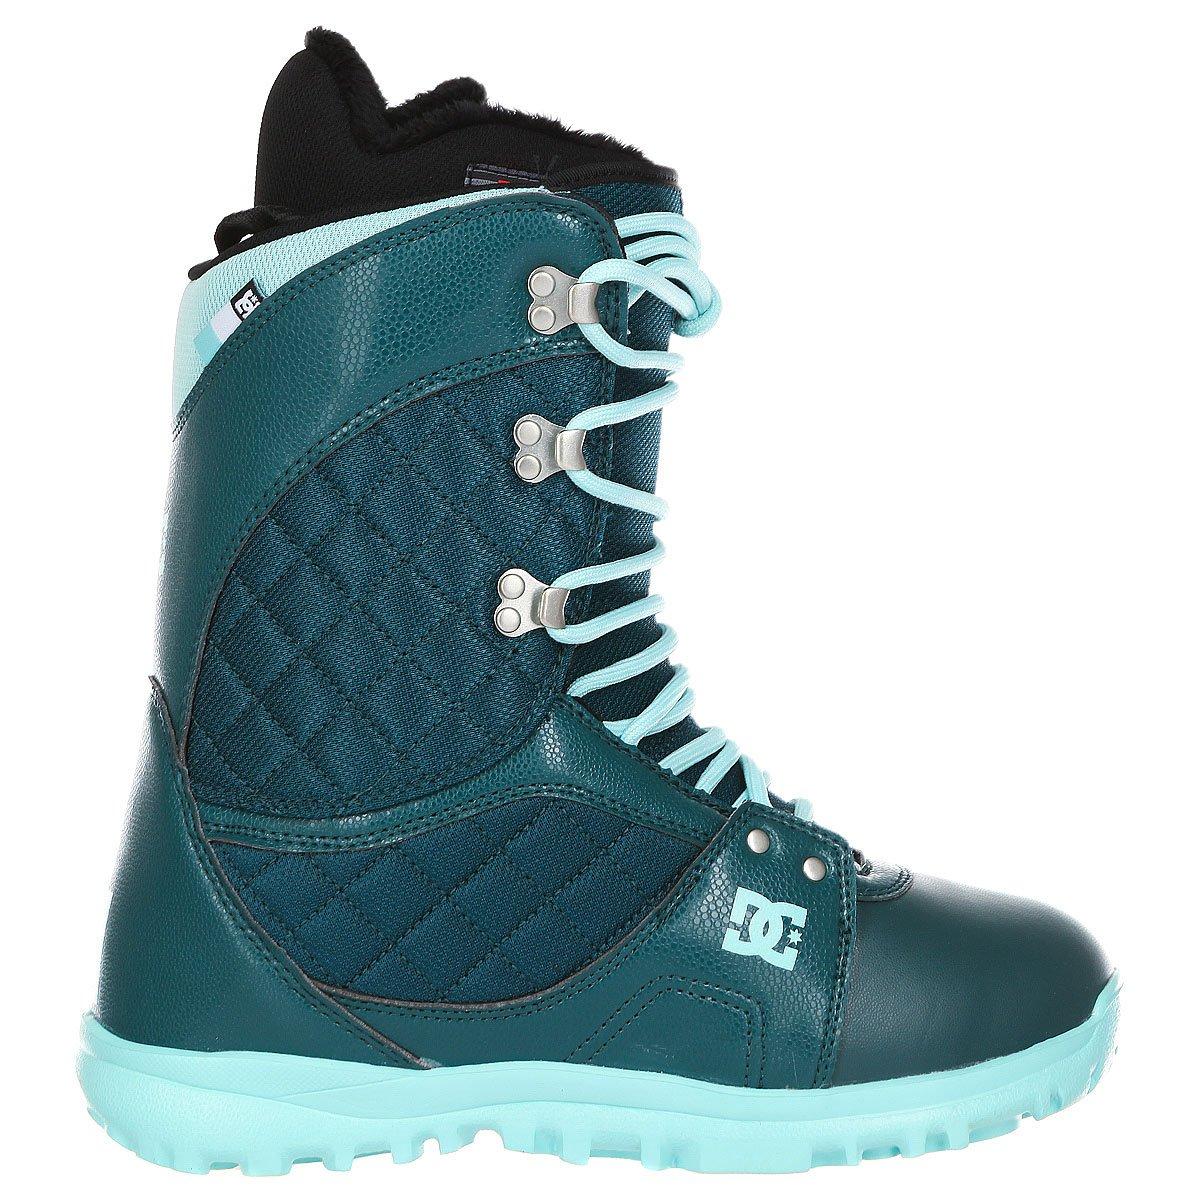 eeb869900353 Купить ботинки для сноуборда женские DC Karma Deep Teal (ADJO200010 ...